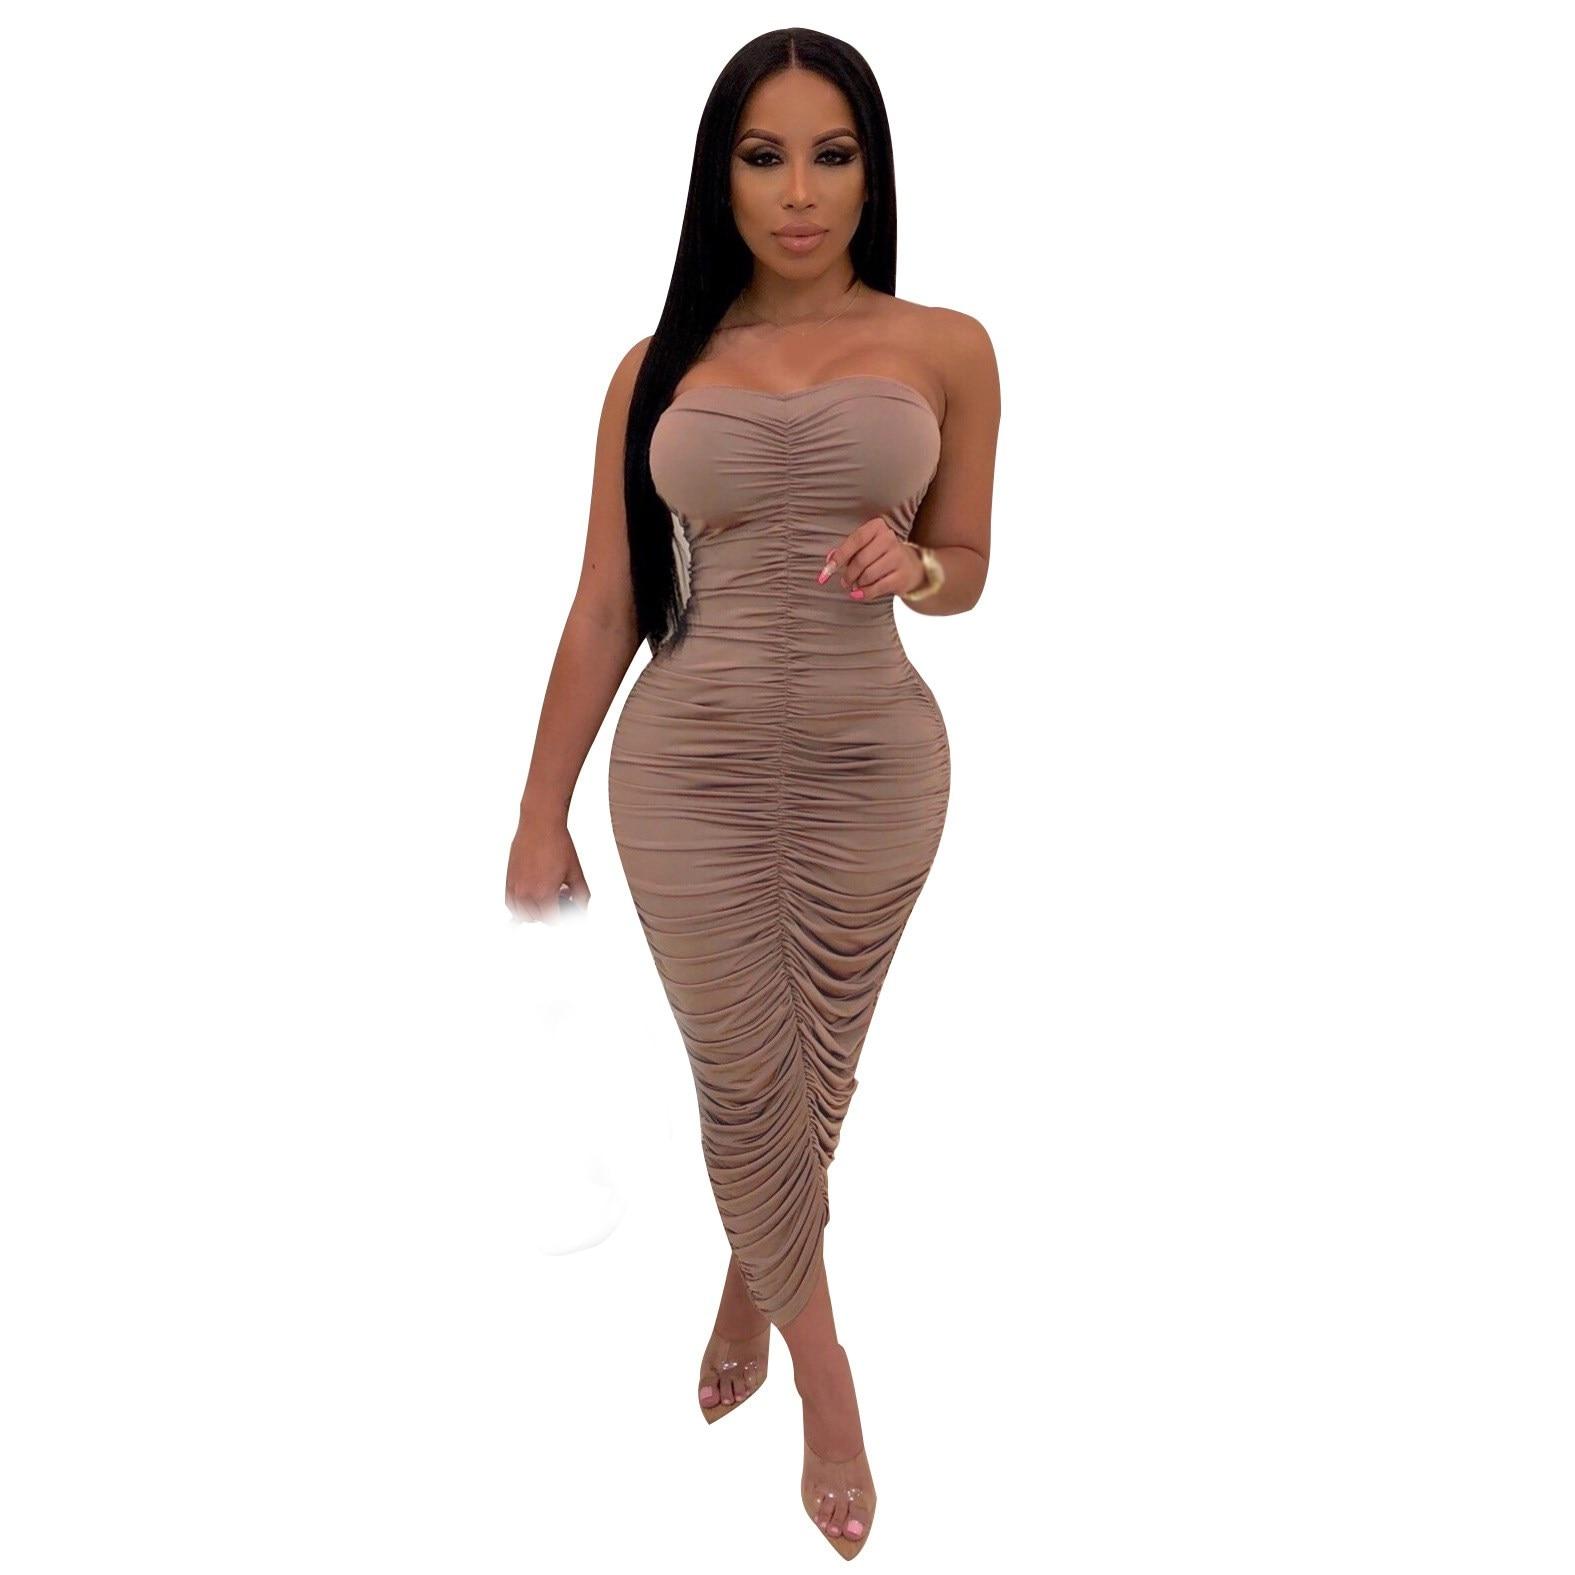 Fashion 2019 Women Summer Maxi Dress Sexy  Club Off Shoulder Pleated Sexy Dress Bodycon Elegant Backless Dress thumbnail